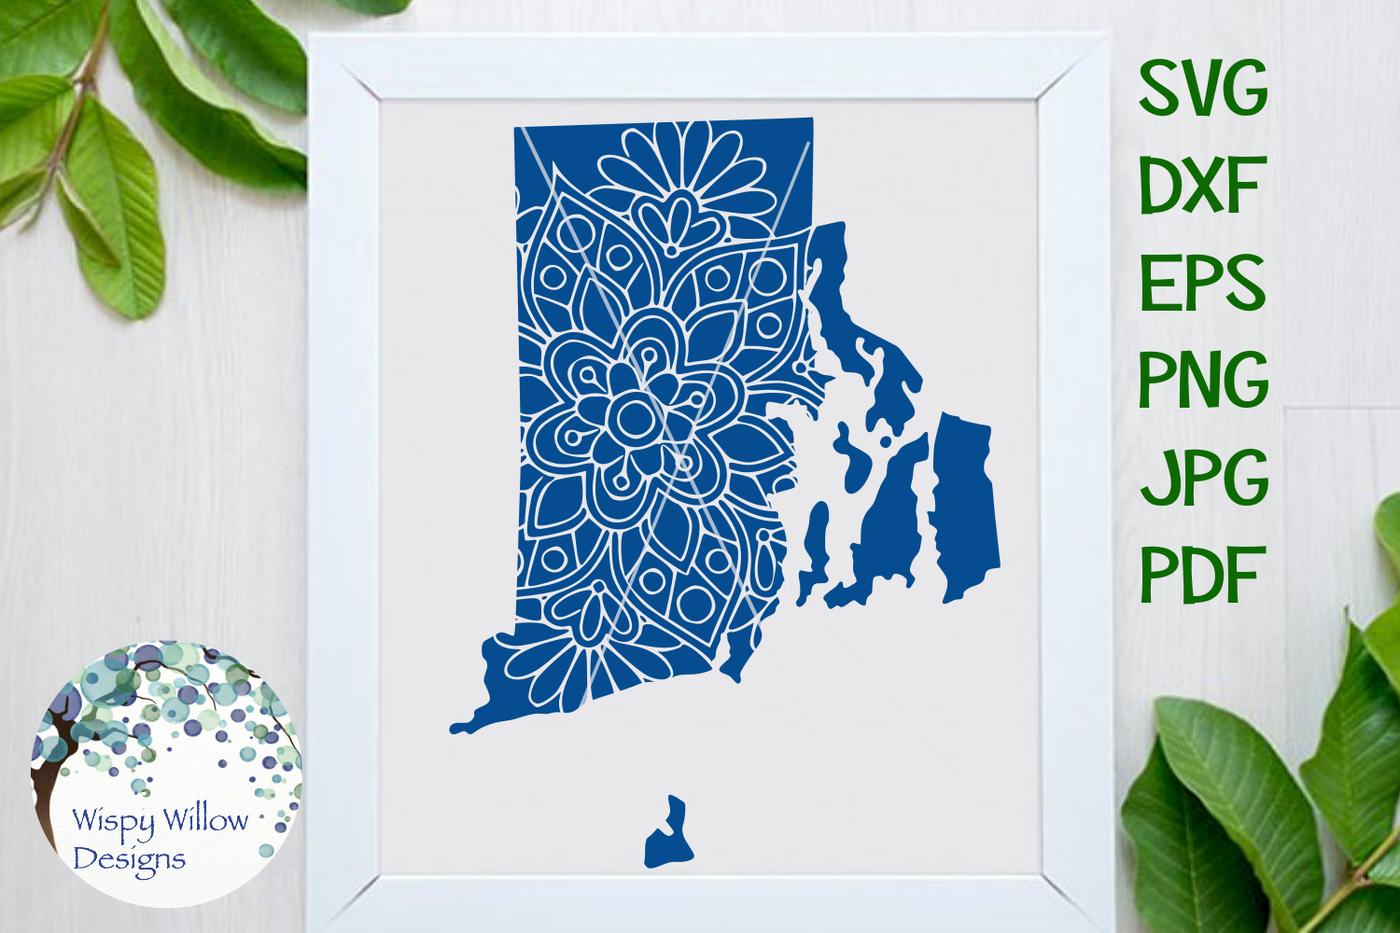 Rhode Island Ri State Floral Mandala Svg Dxf Eps Png Jpg Pdf By